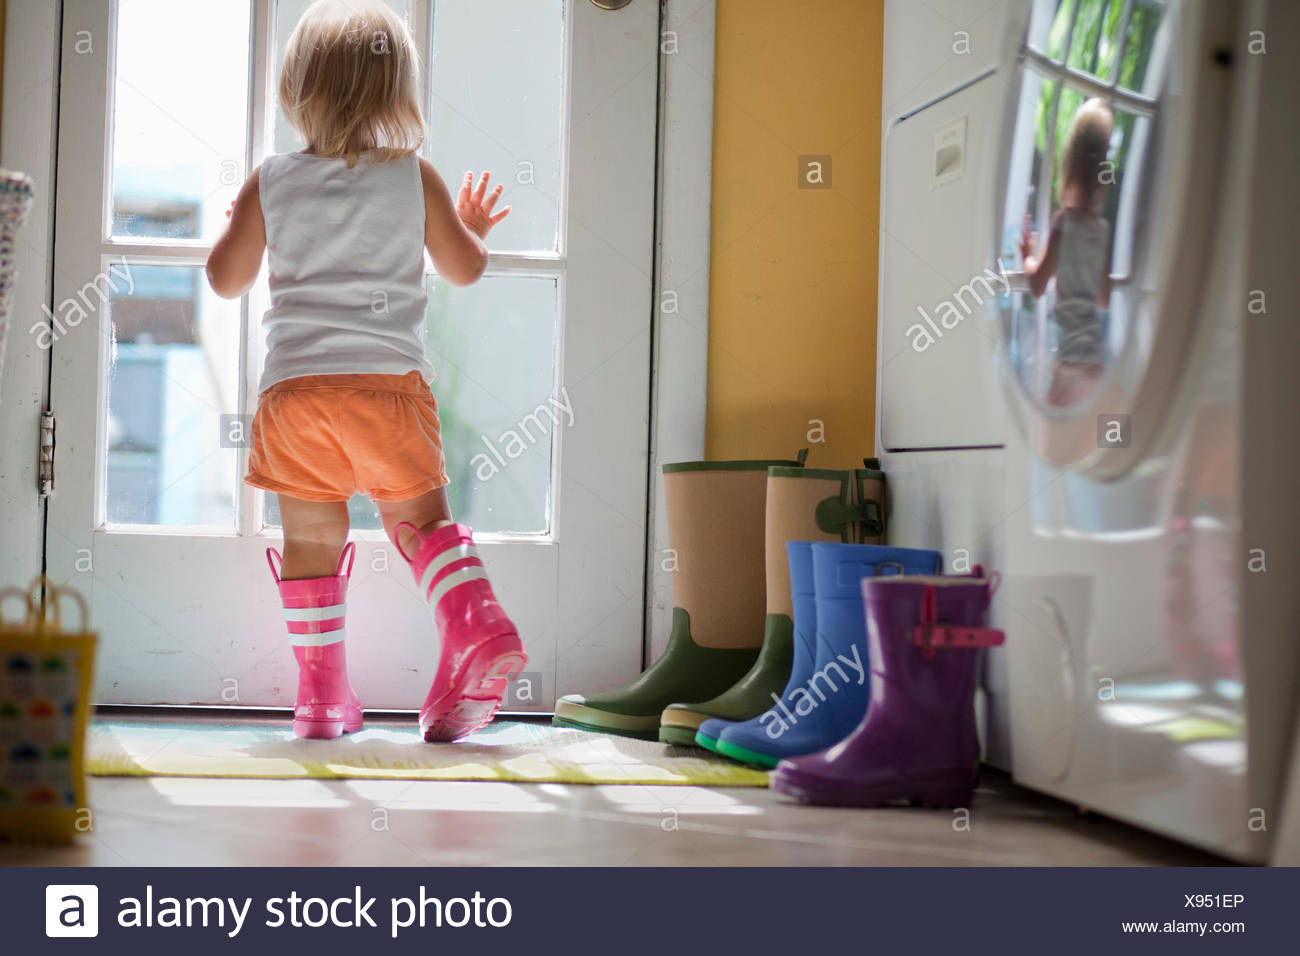 Hembra usando botas de goma niño mirando por la ventana de la puerta trasera Imagen De Stock